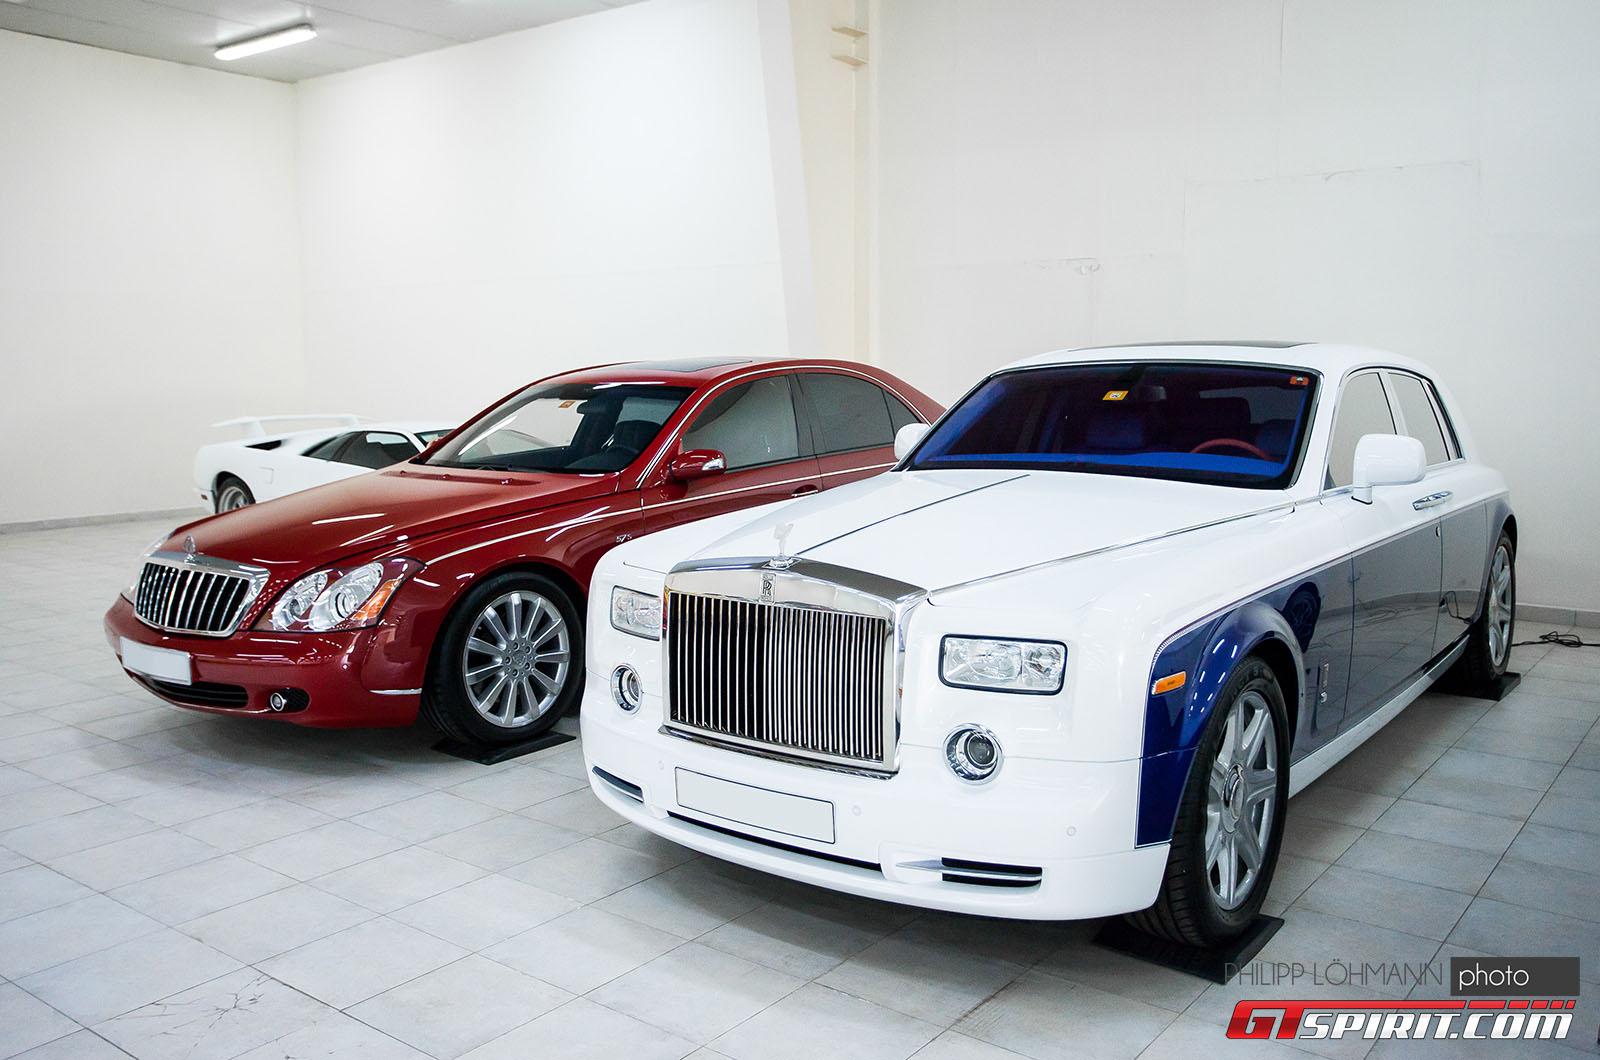 Гараж мечты в Абу-Даби. Rolls-Royce Phantom